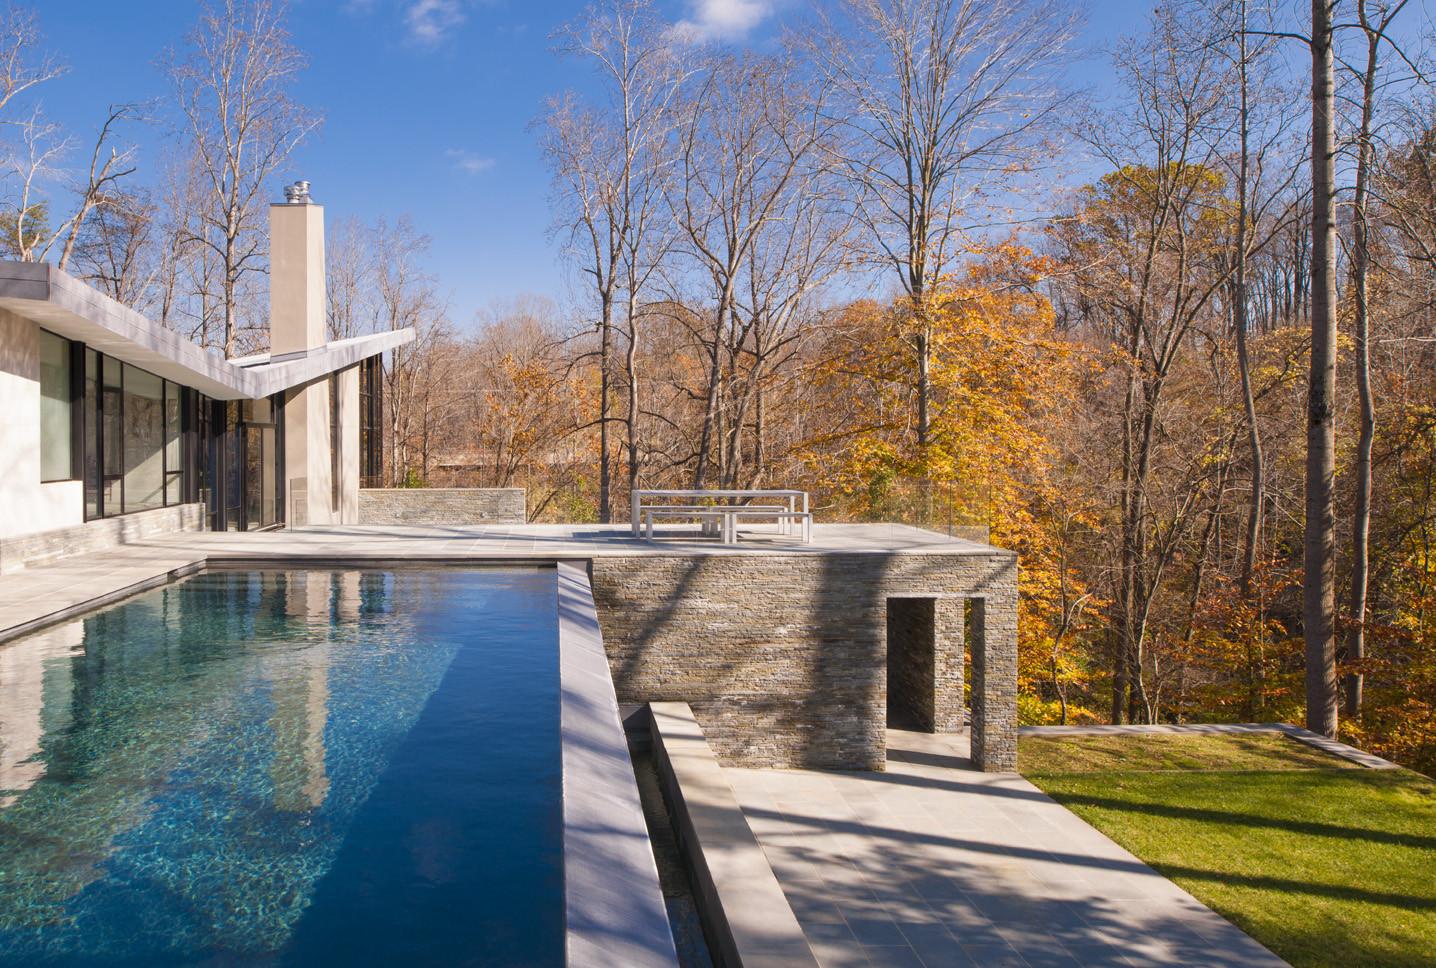 Residencia Difficult Run / Robert M. Gurney Architect, © Maxwell MacKenzie Architectural Photographer